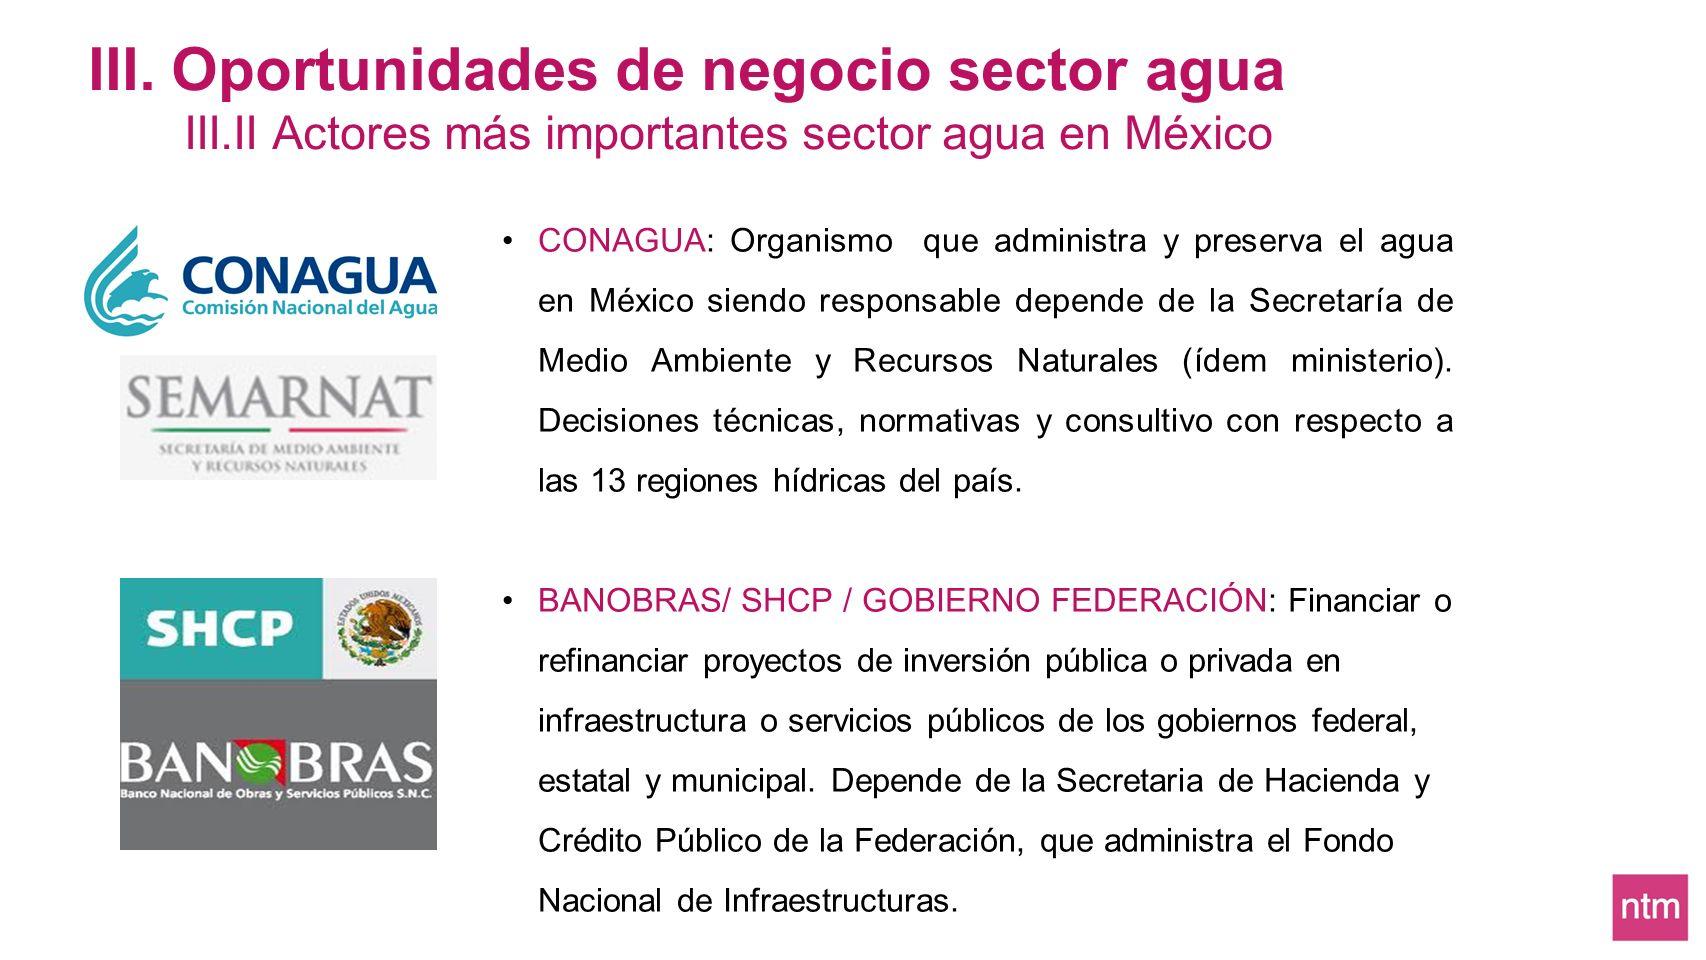 III. Oportunidades de negocio sector agua